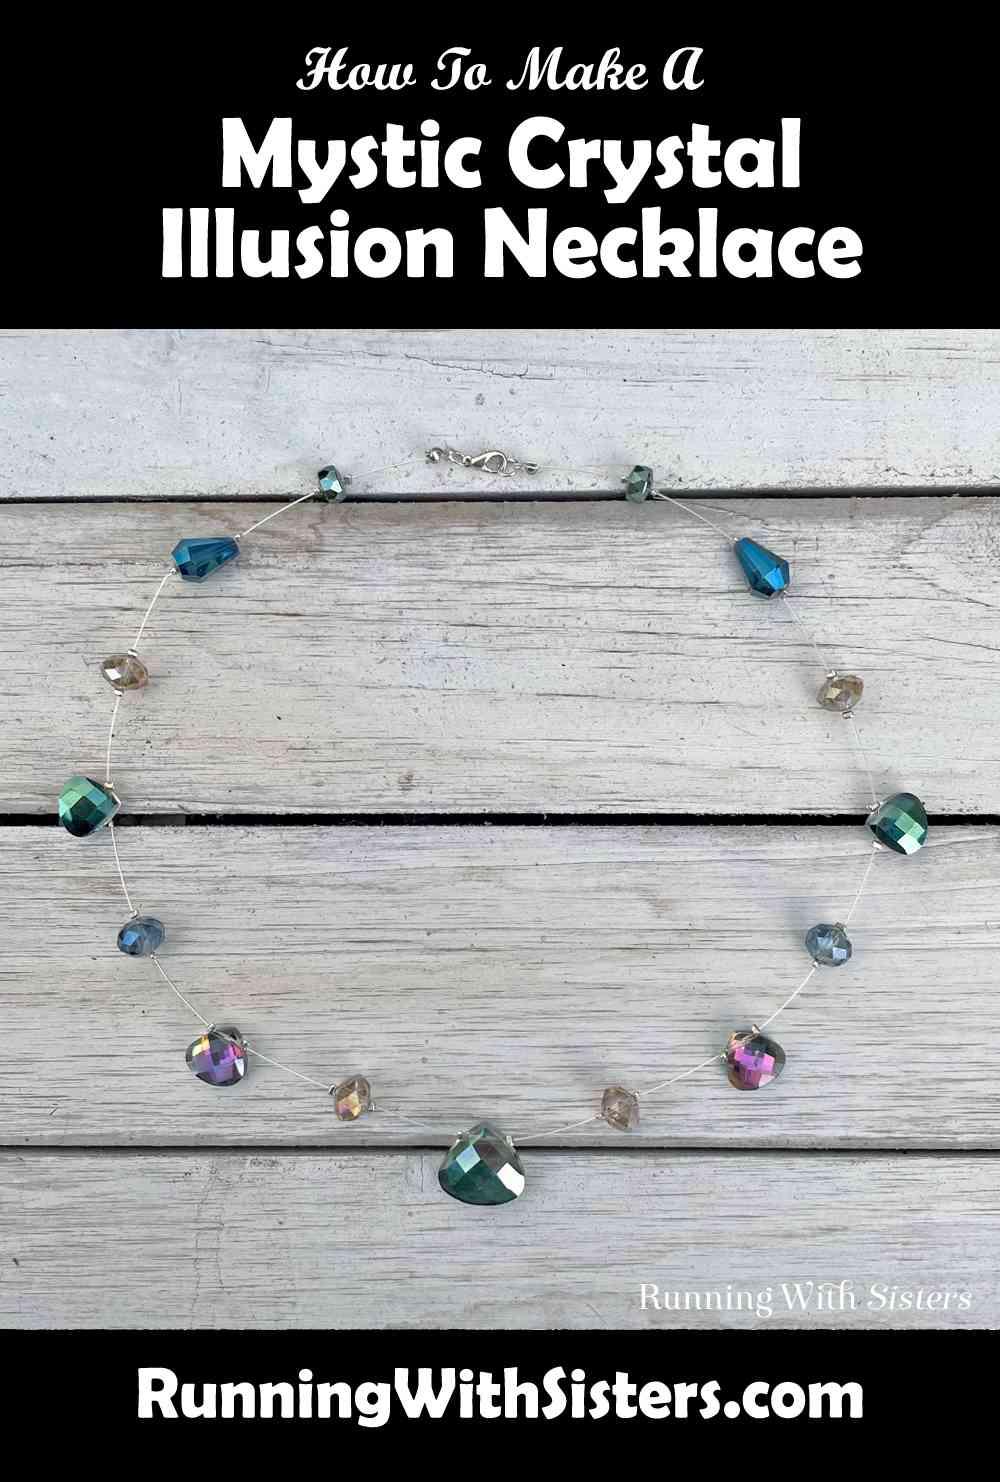 Mystic Crystal Illusion Necklace Pinterest